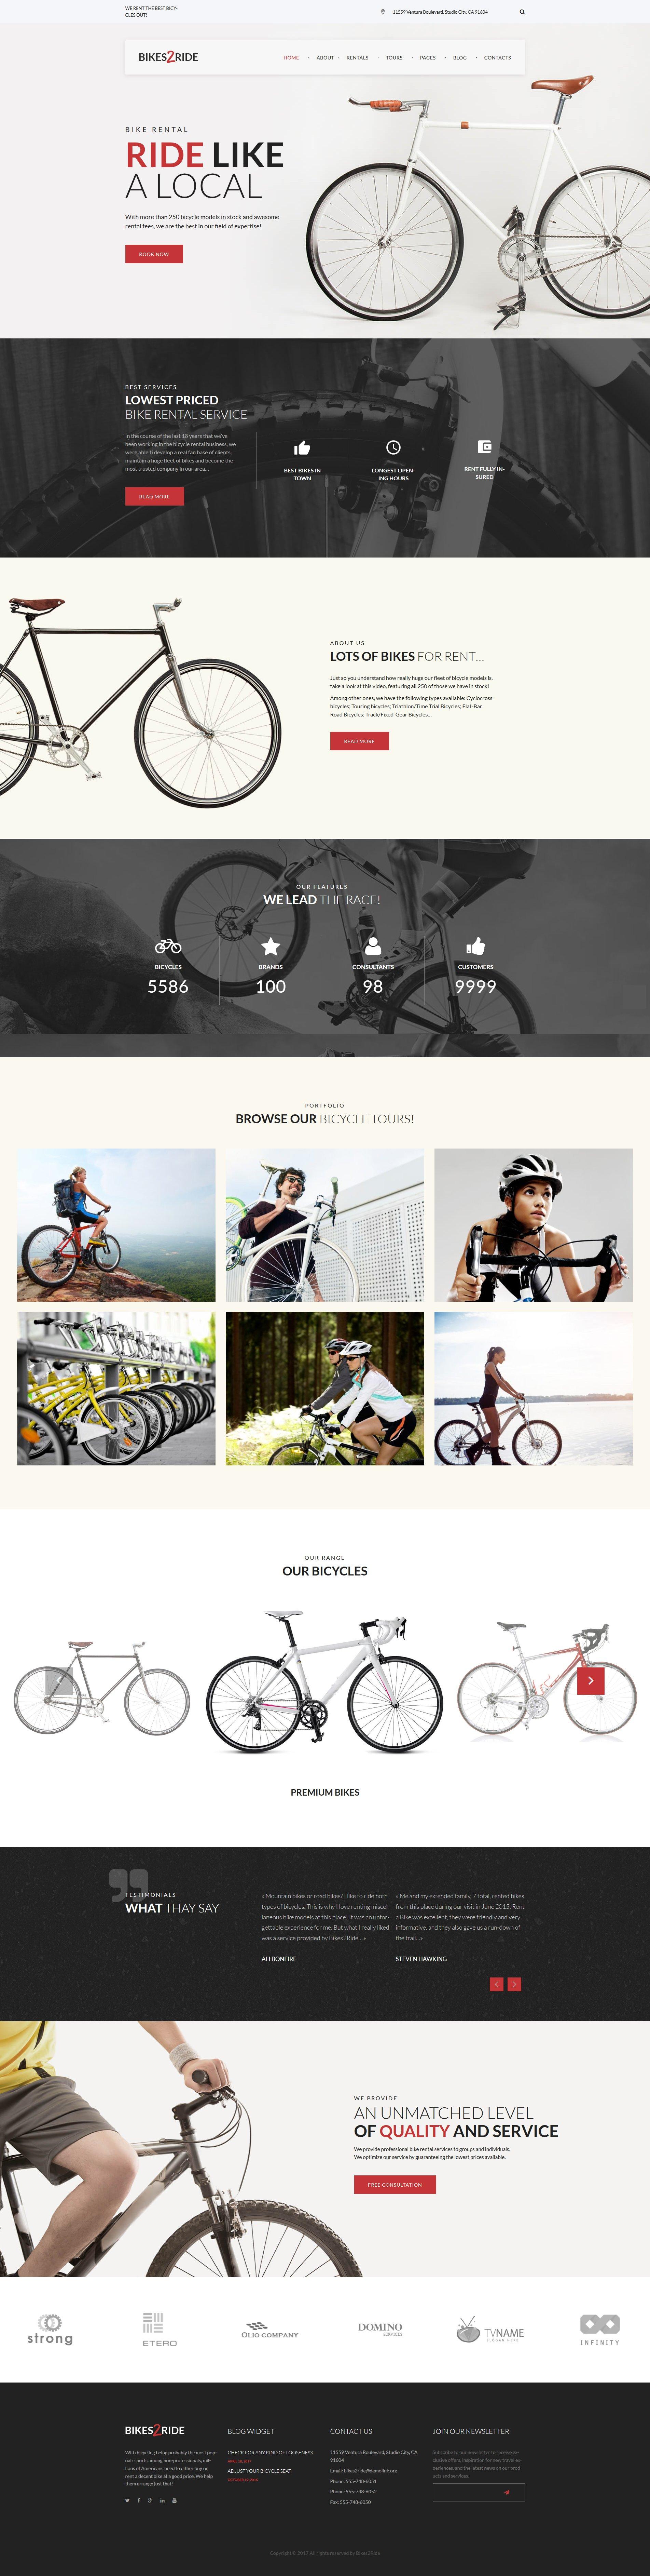 Адаптивный шаблон сайта на тему велоспорт #64031